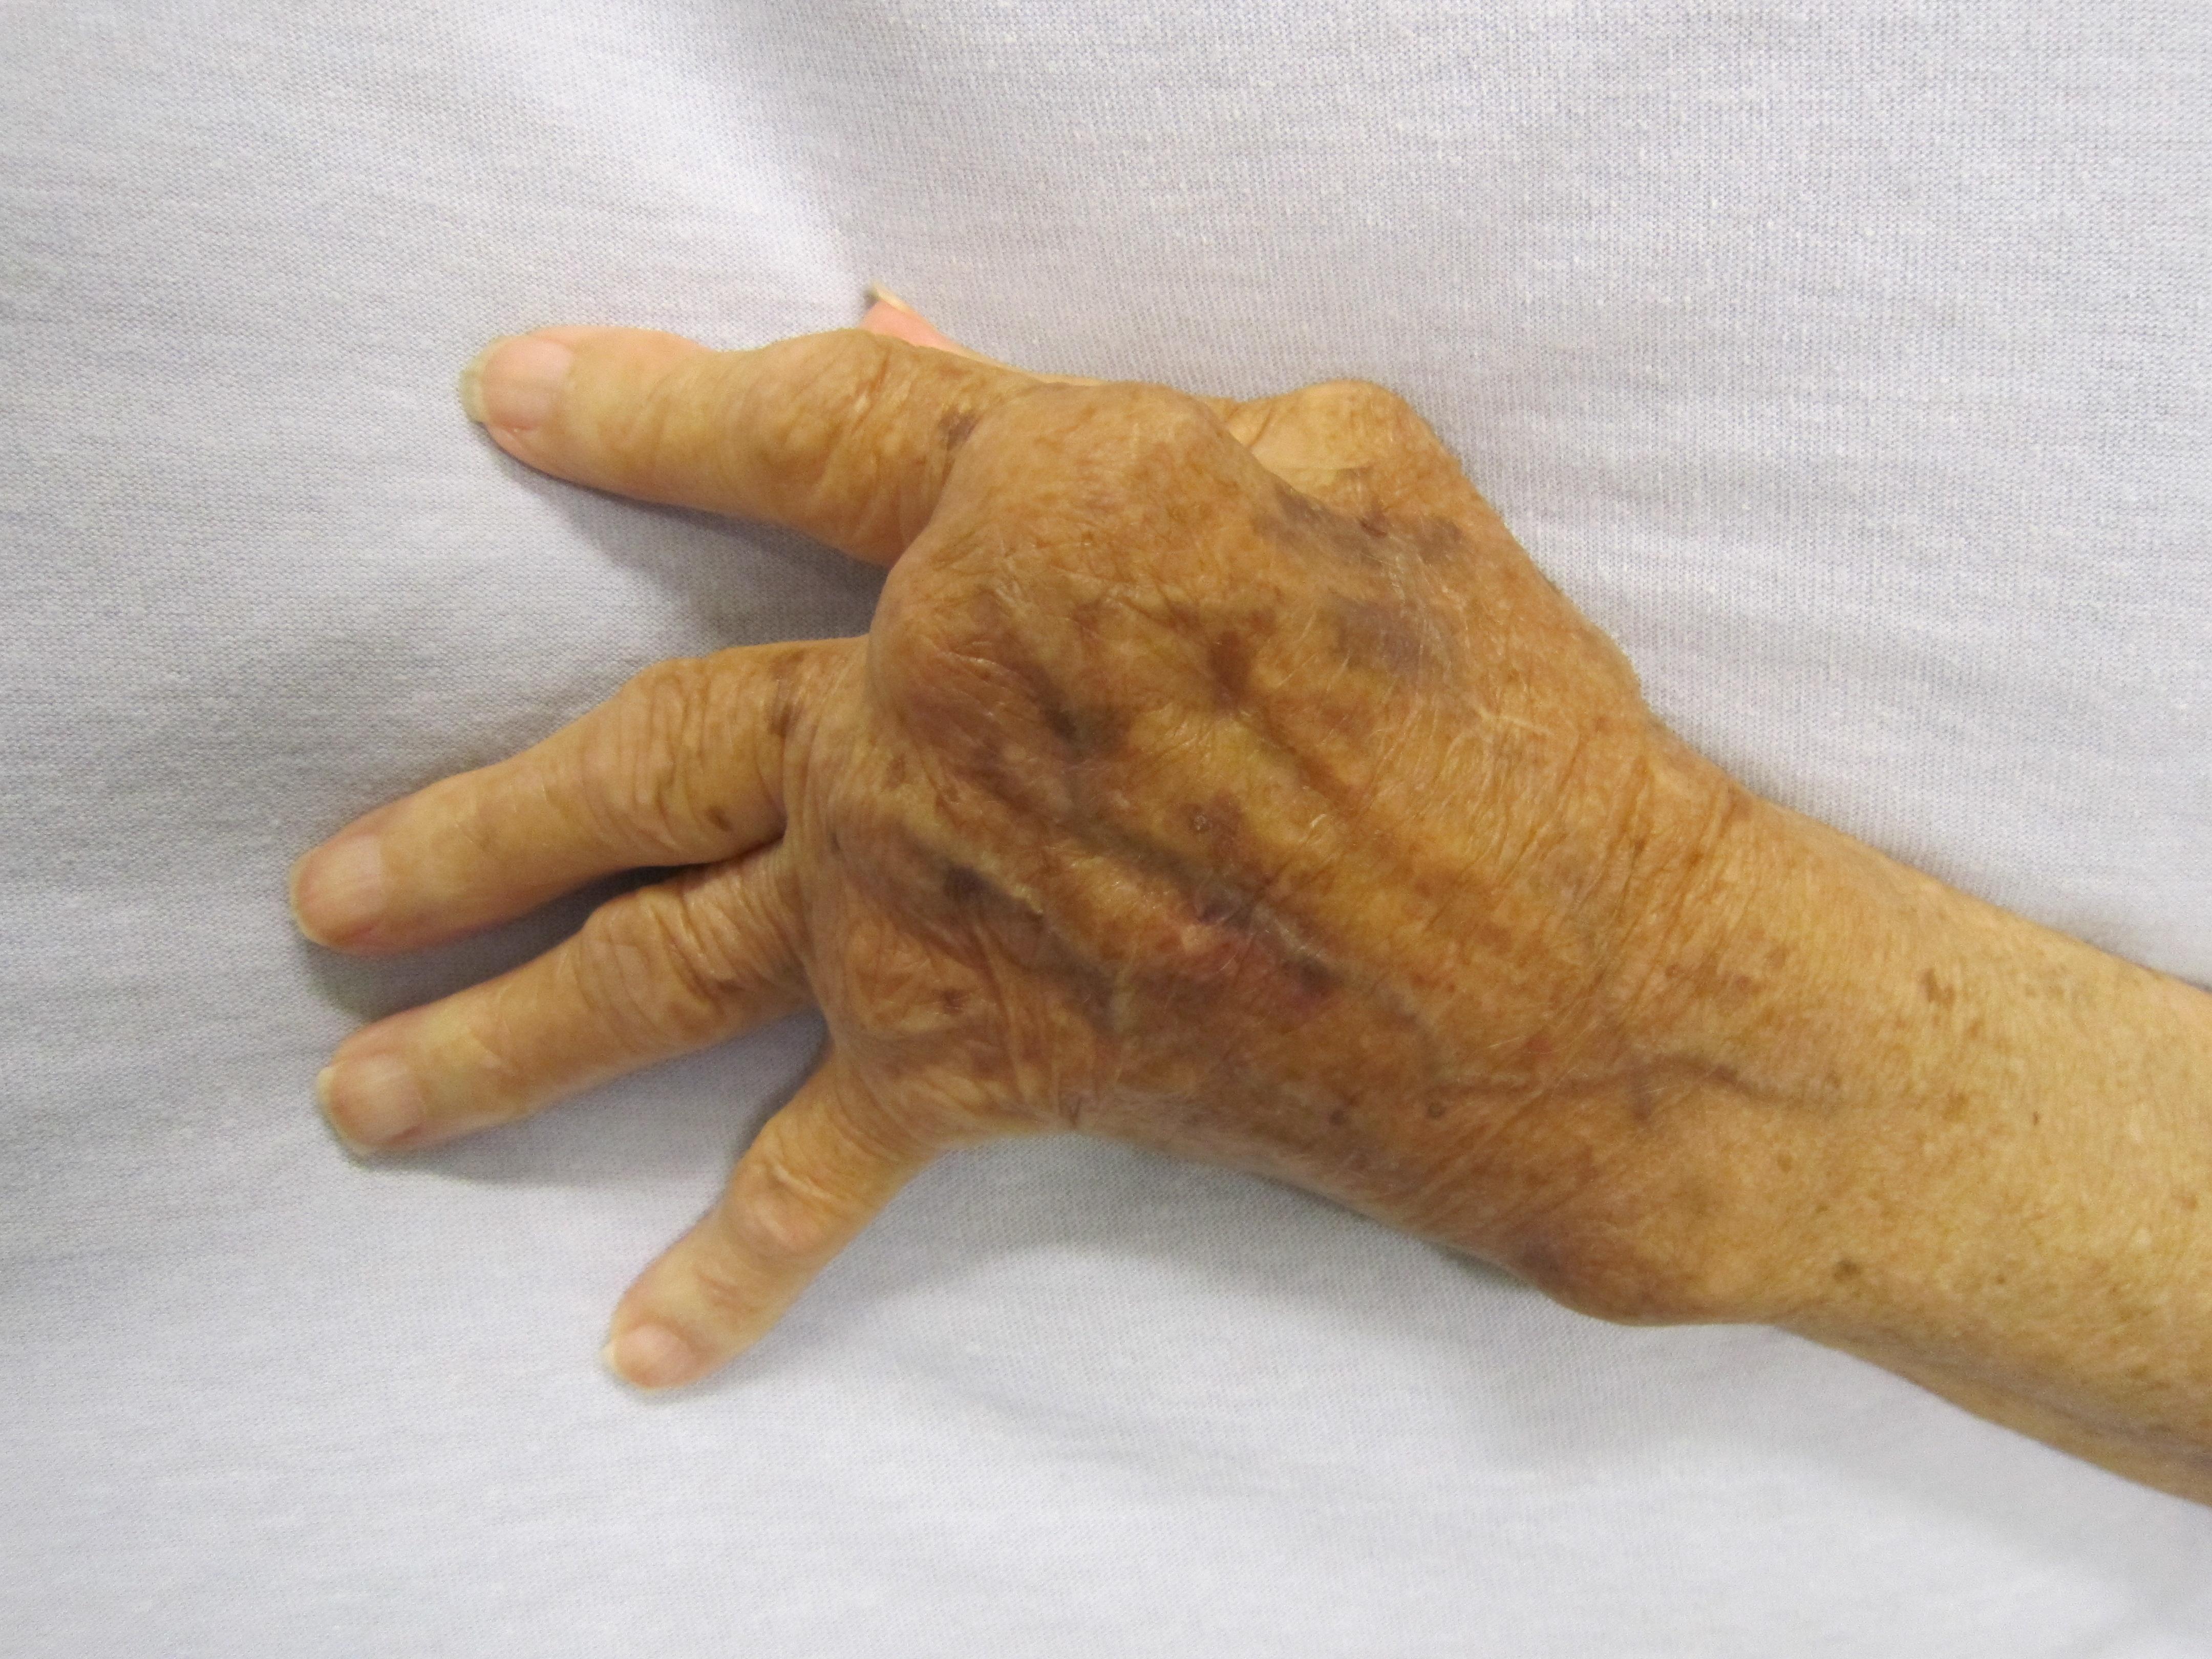 kezdődő reumatoid arthritis tünetei